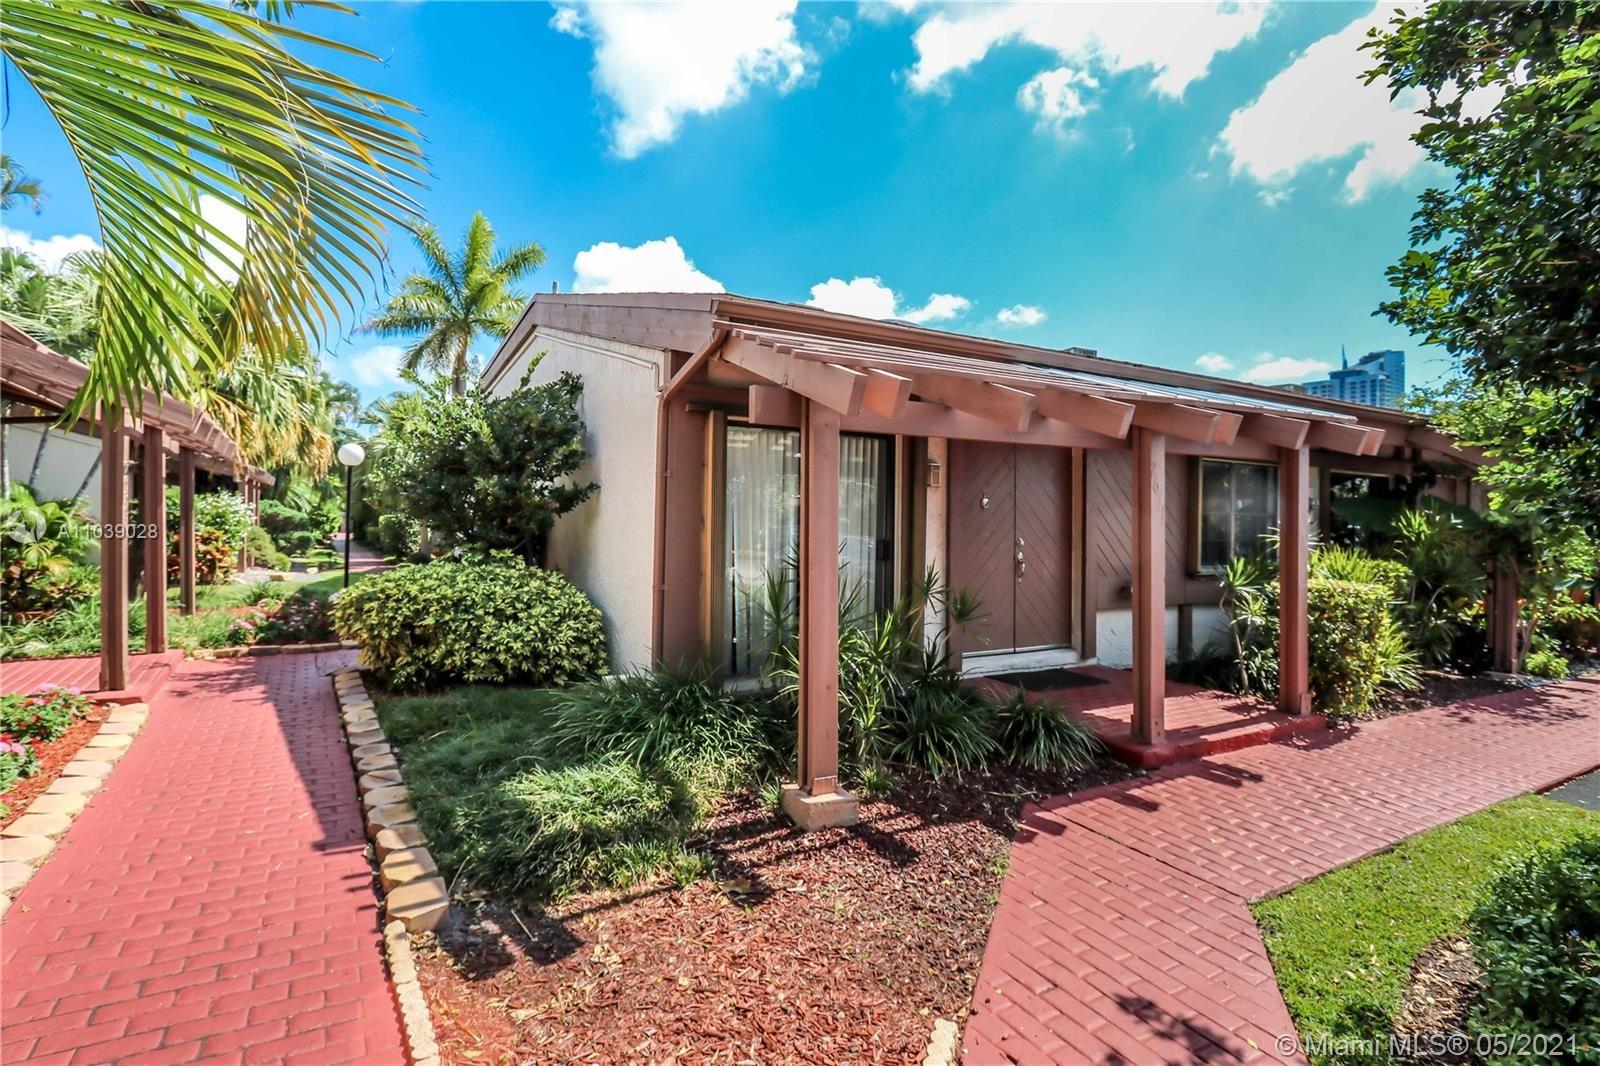 Photo of 2671 S Parkview Dr, Hallandale Beach, FL 33009 (MLS # A11039028)